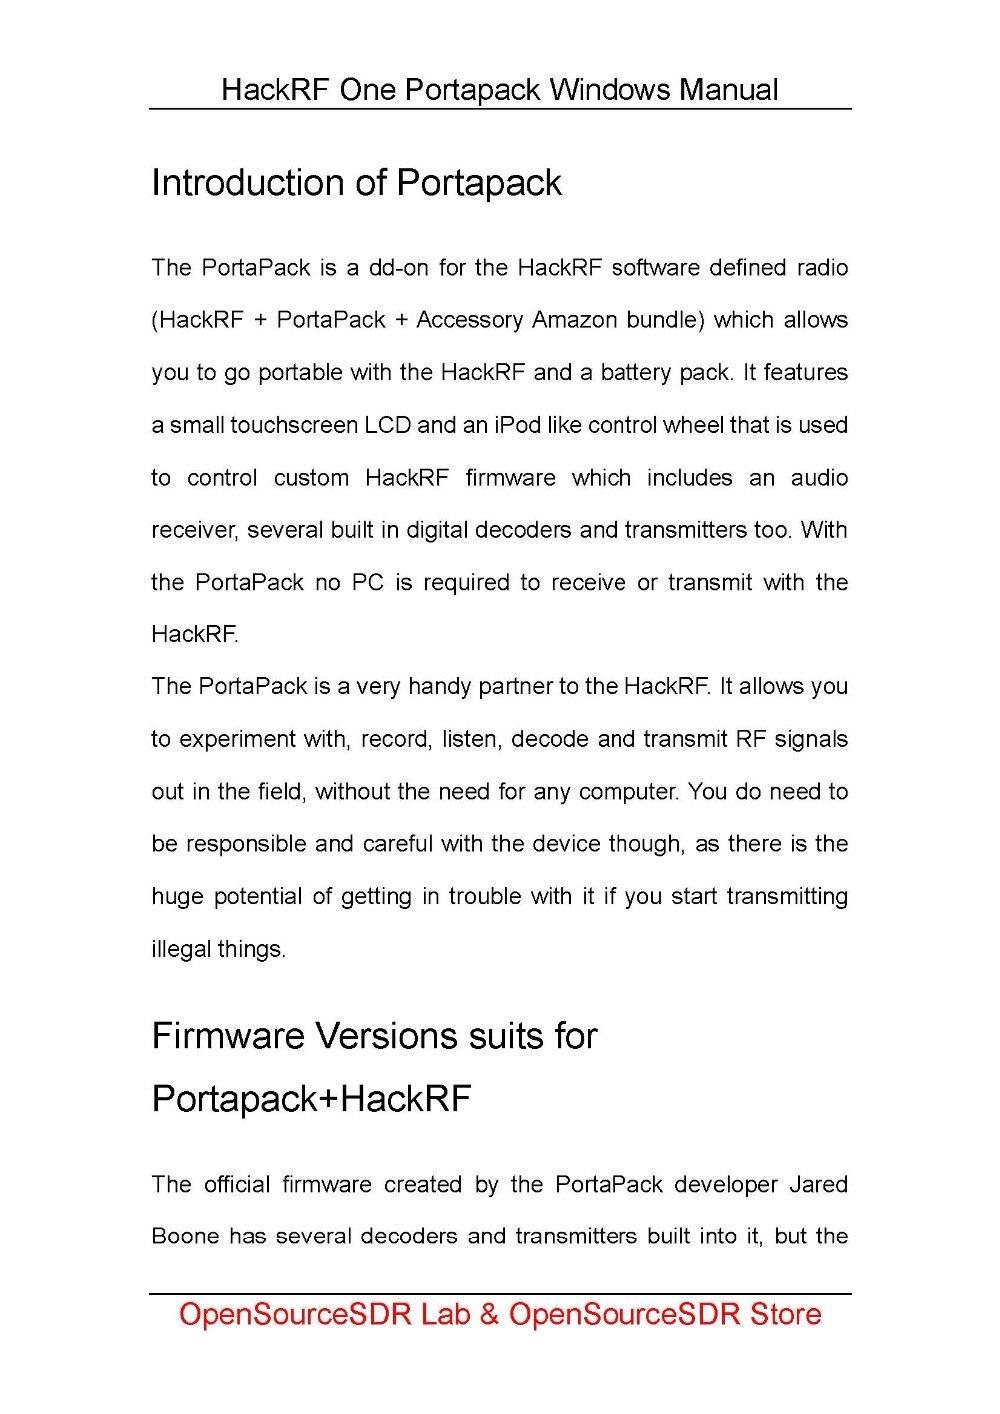 HackRF portapack windows_页面_01